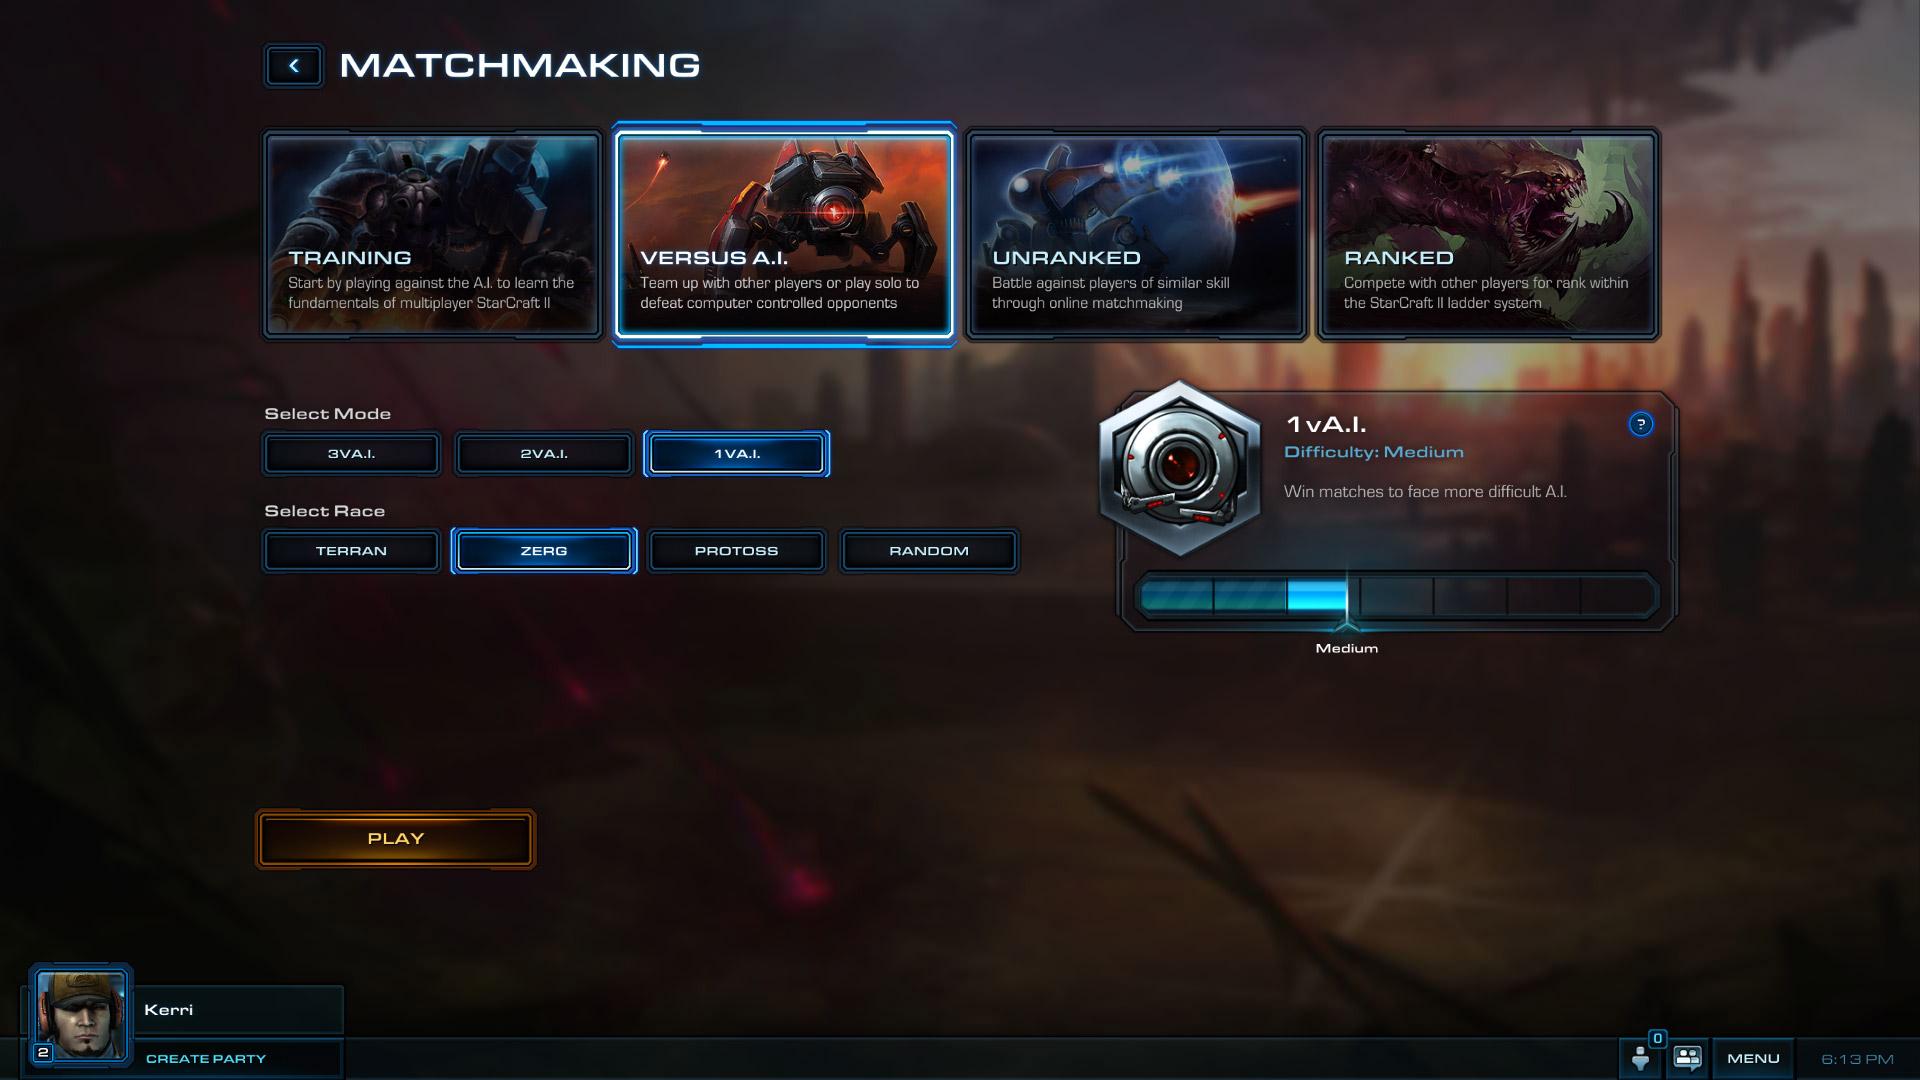 Starcraft 2 matchmaking screen not loading